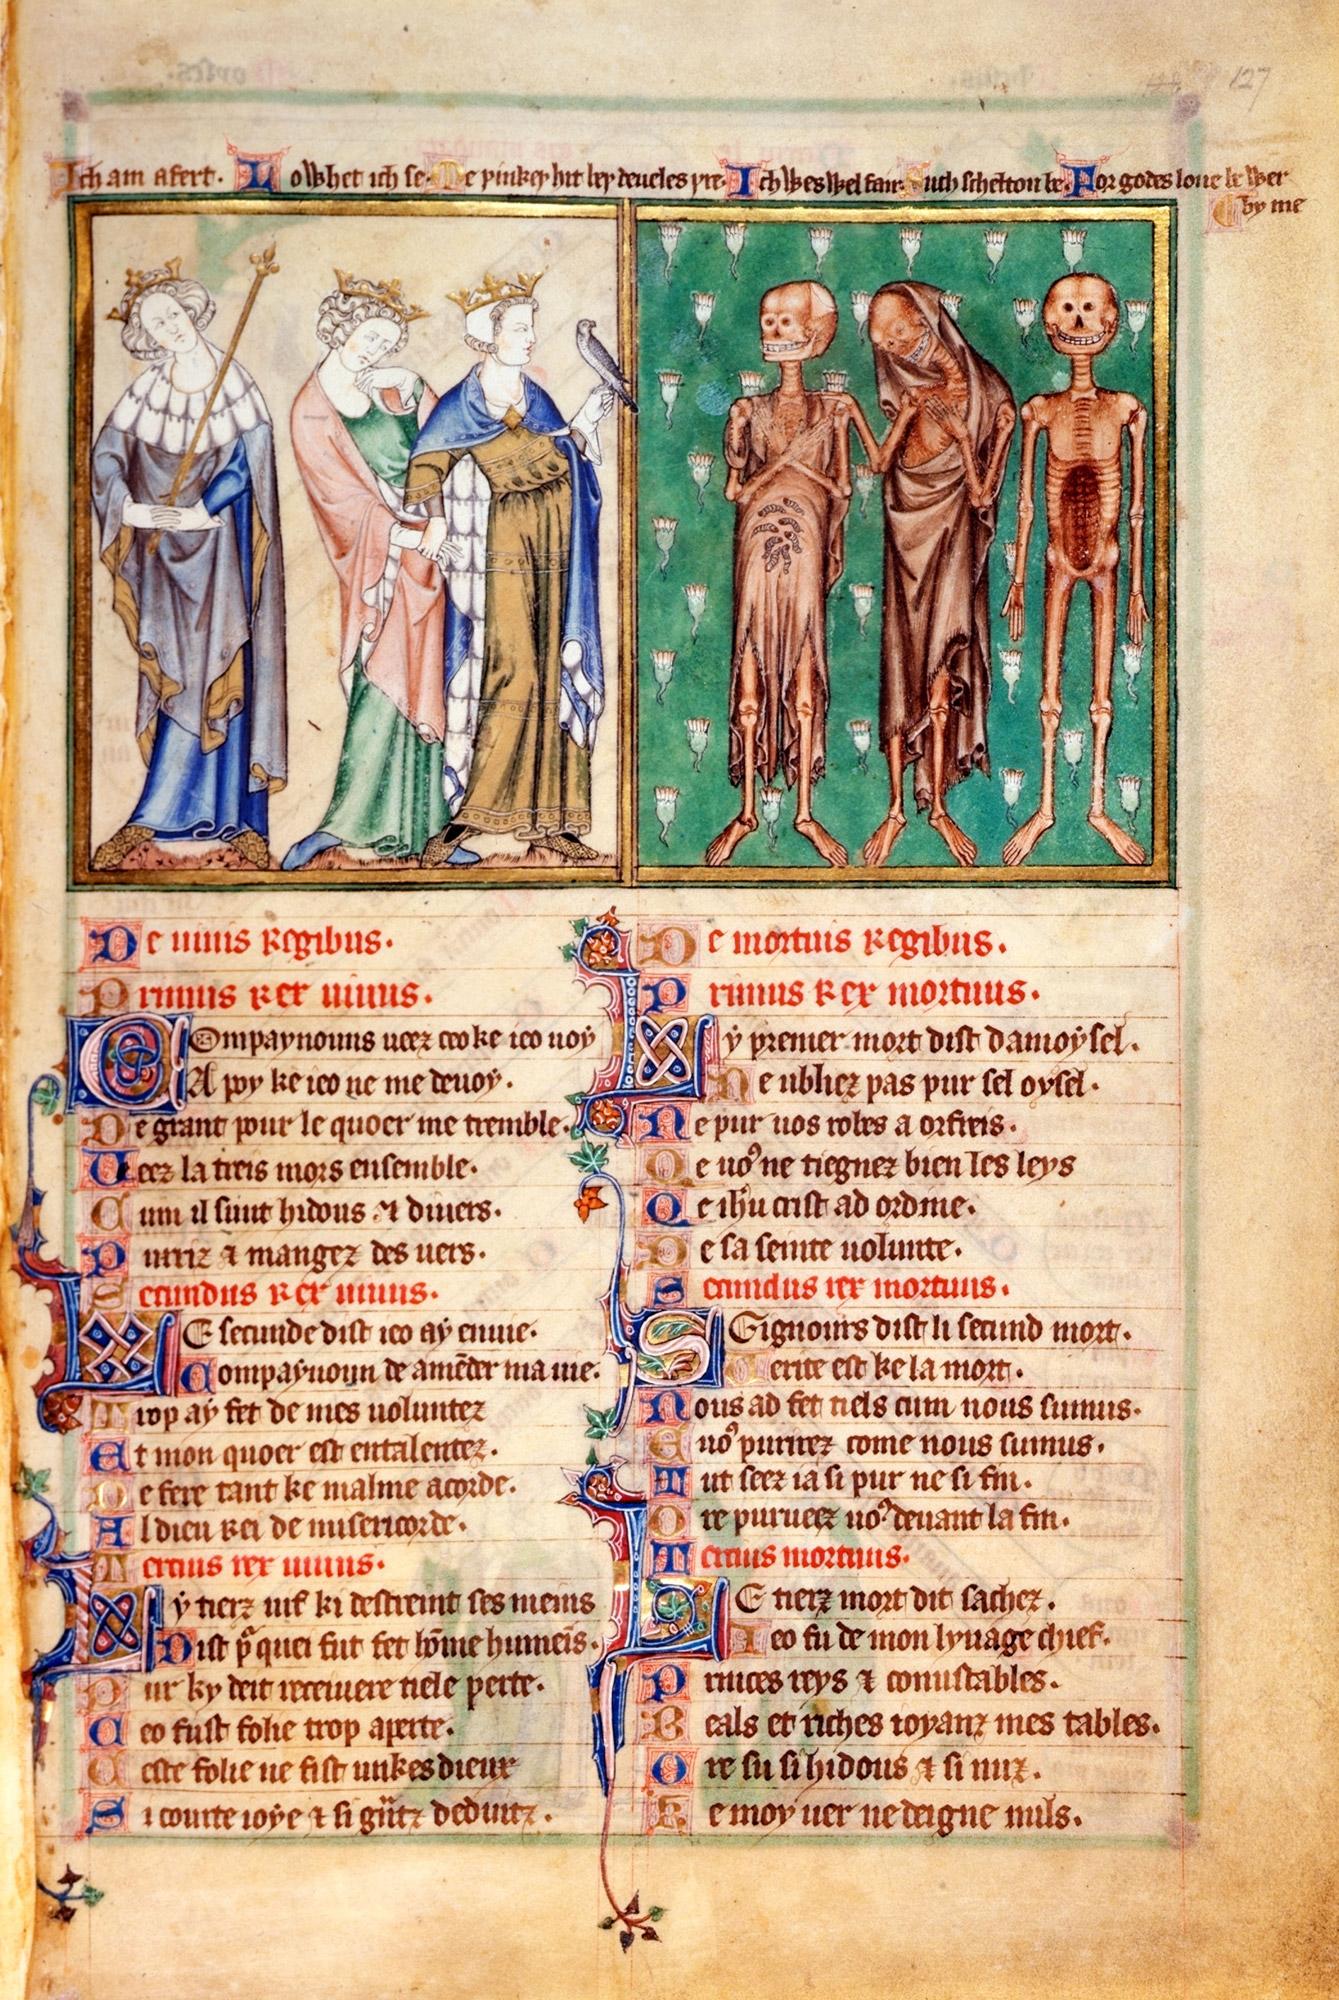 DeLisle Psalter, ca. 1310-20 (British Library, Arundel MS 83 II, f. 127)